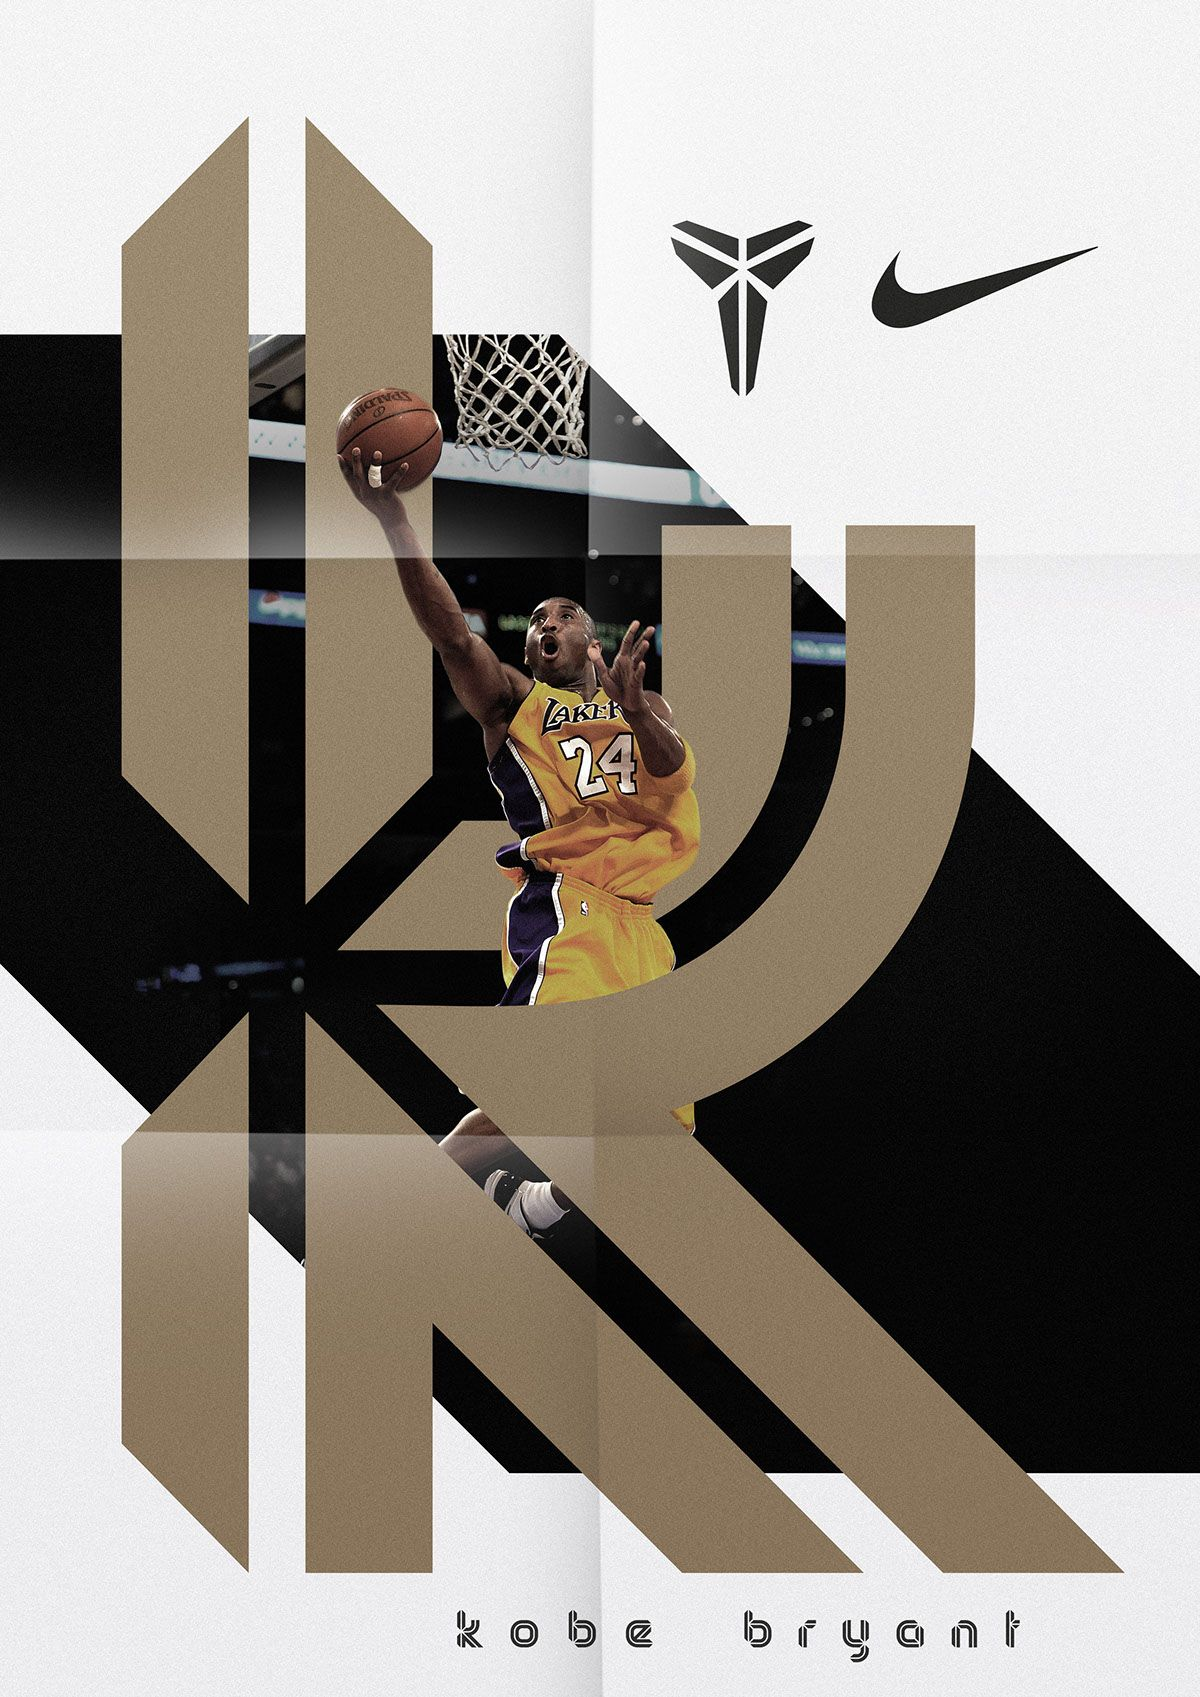 Brand typeface for NBA basketball player Kobe Bryant